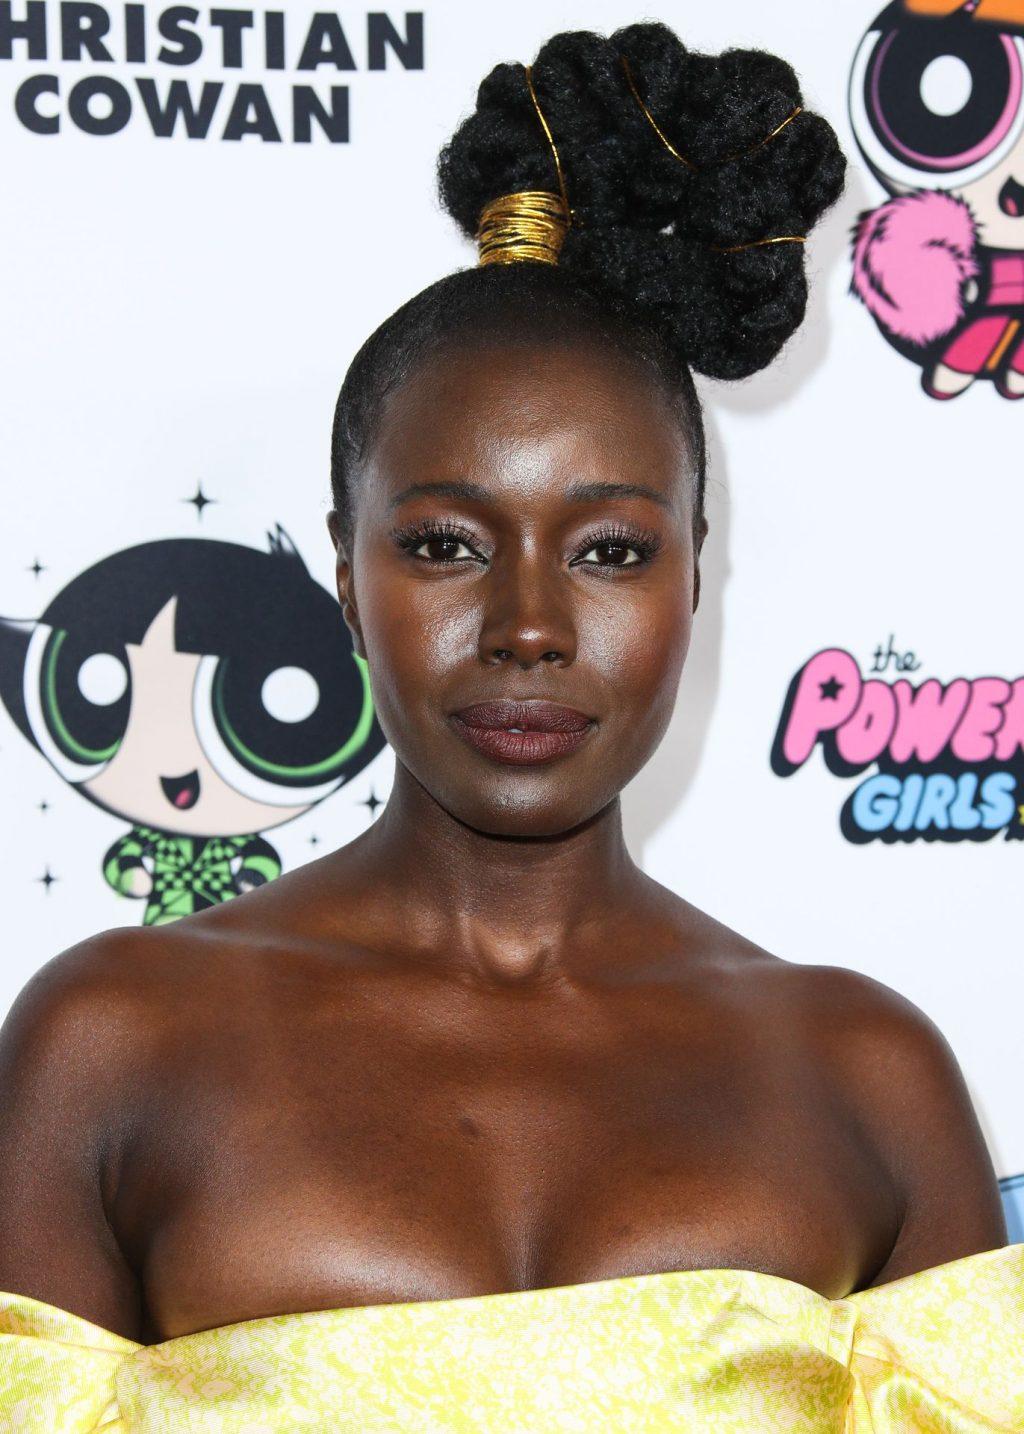 Anna Diop Flaunts Her Great Cleavage at the Christian Cowan x Powerpuff Girls Runway Show (4 Photos)